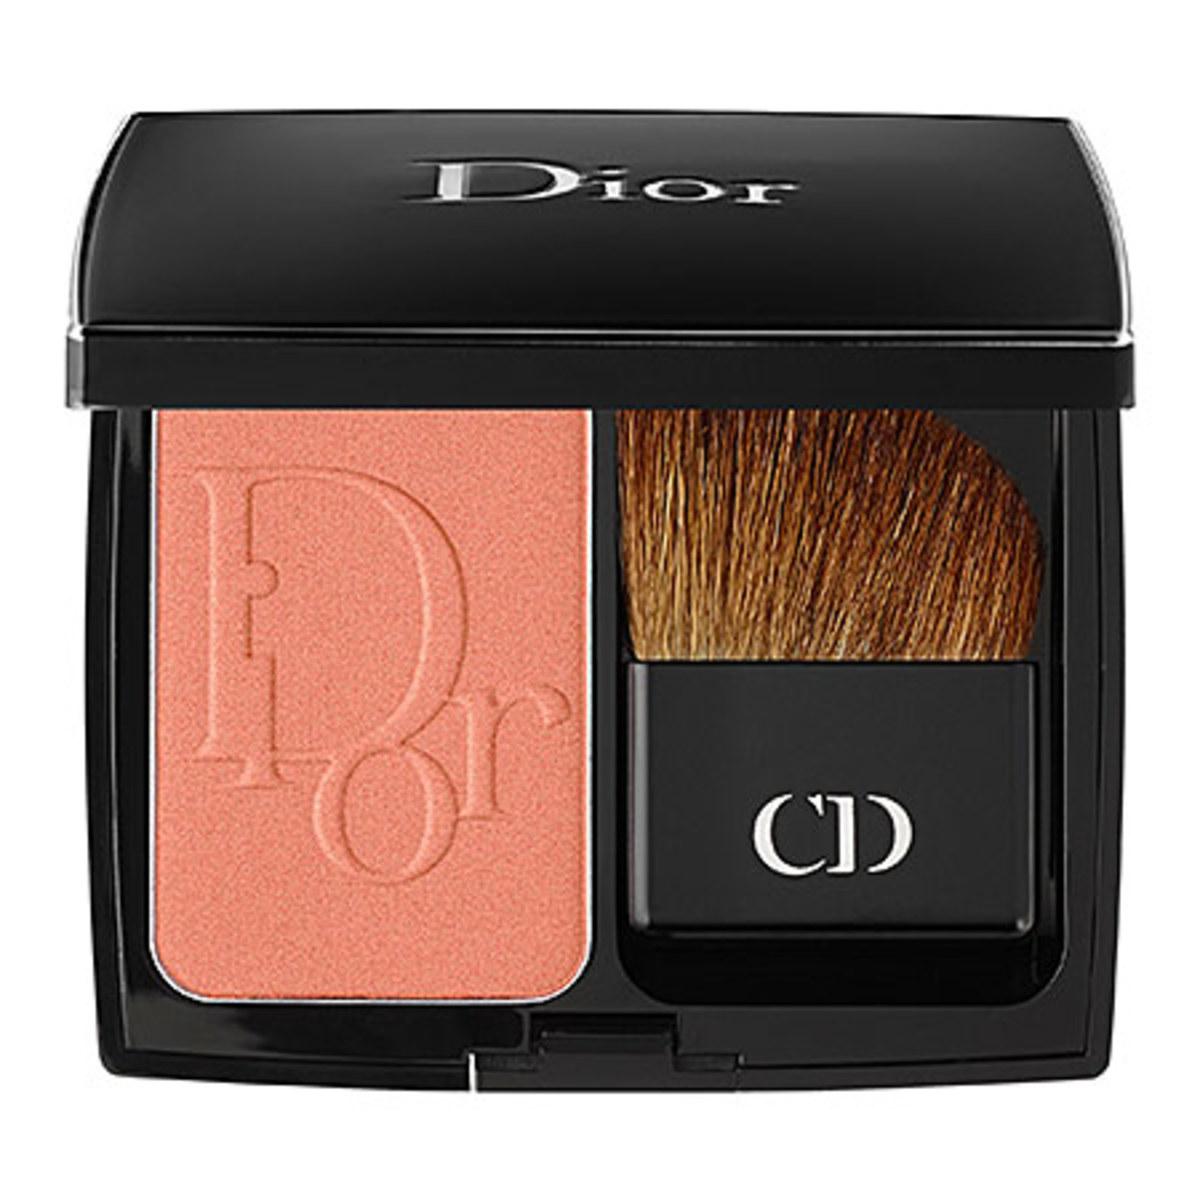 Dior DiorBlush Vibrant Colour Powder Blush in 943 My Rose